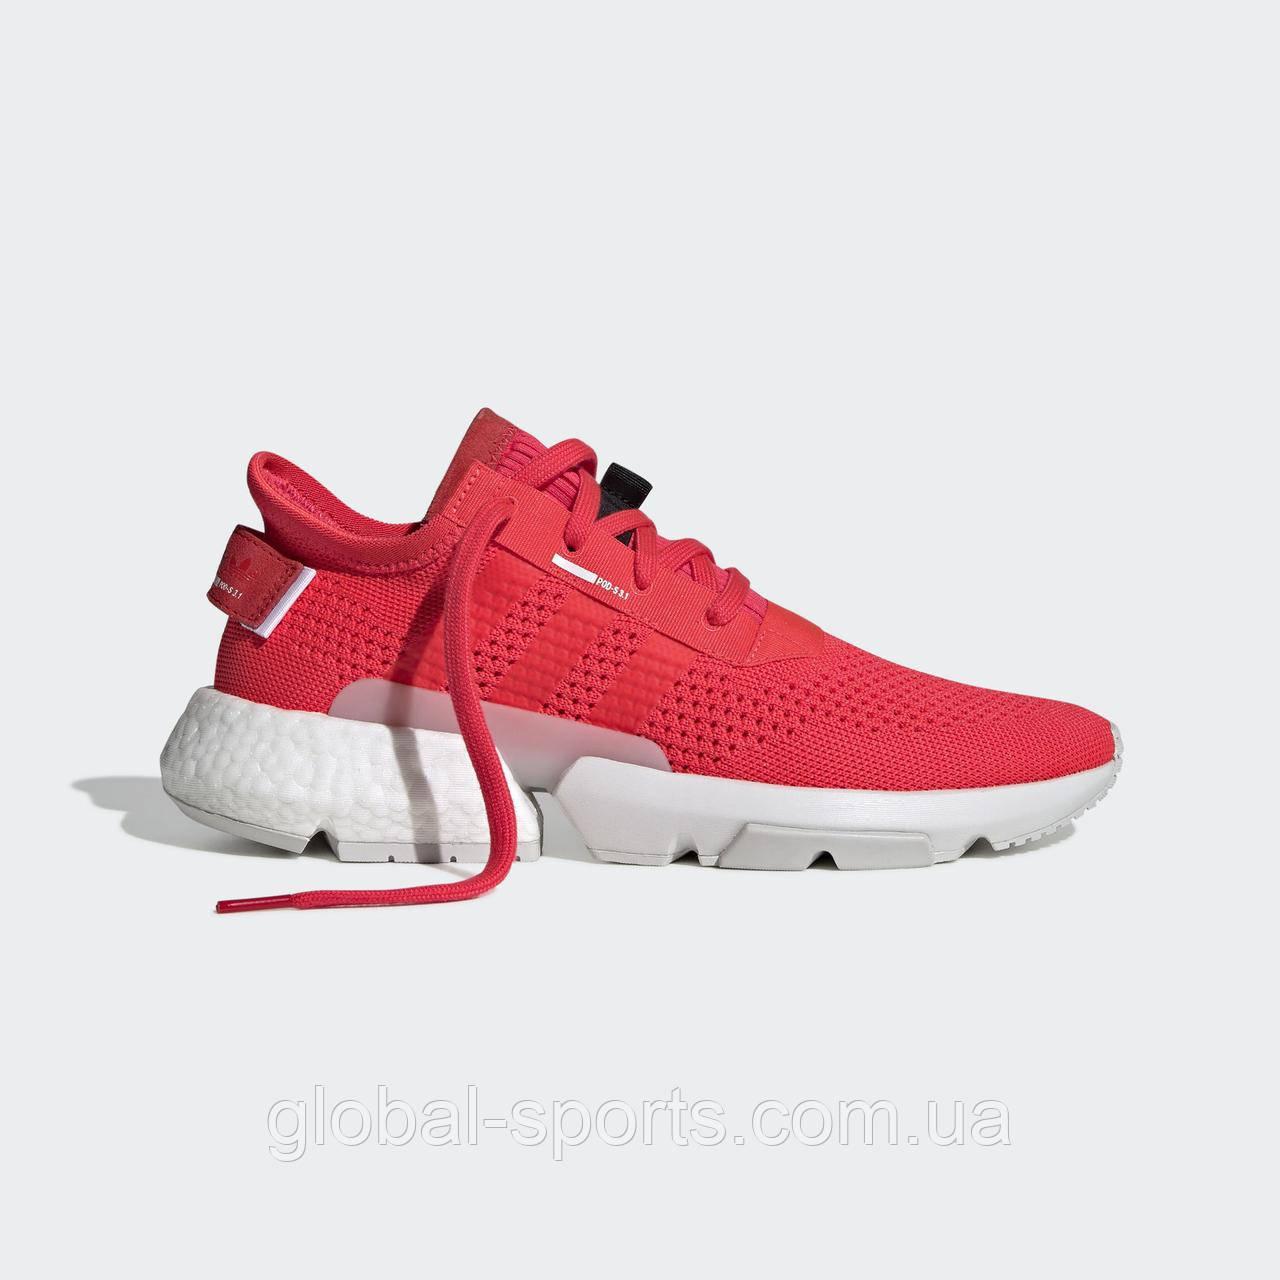 Мужские кроссовки Adidas POD-S3.1(Артикул:CG7126)